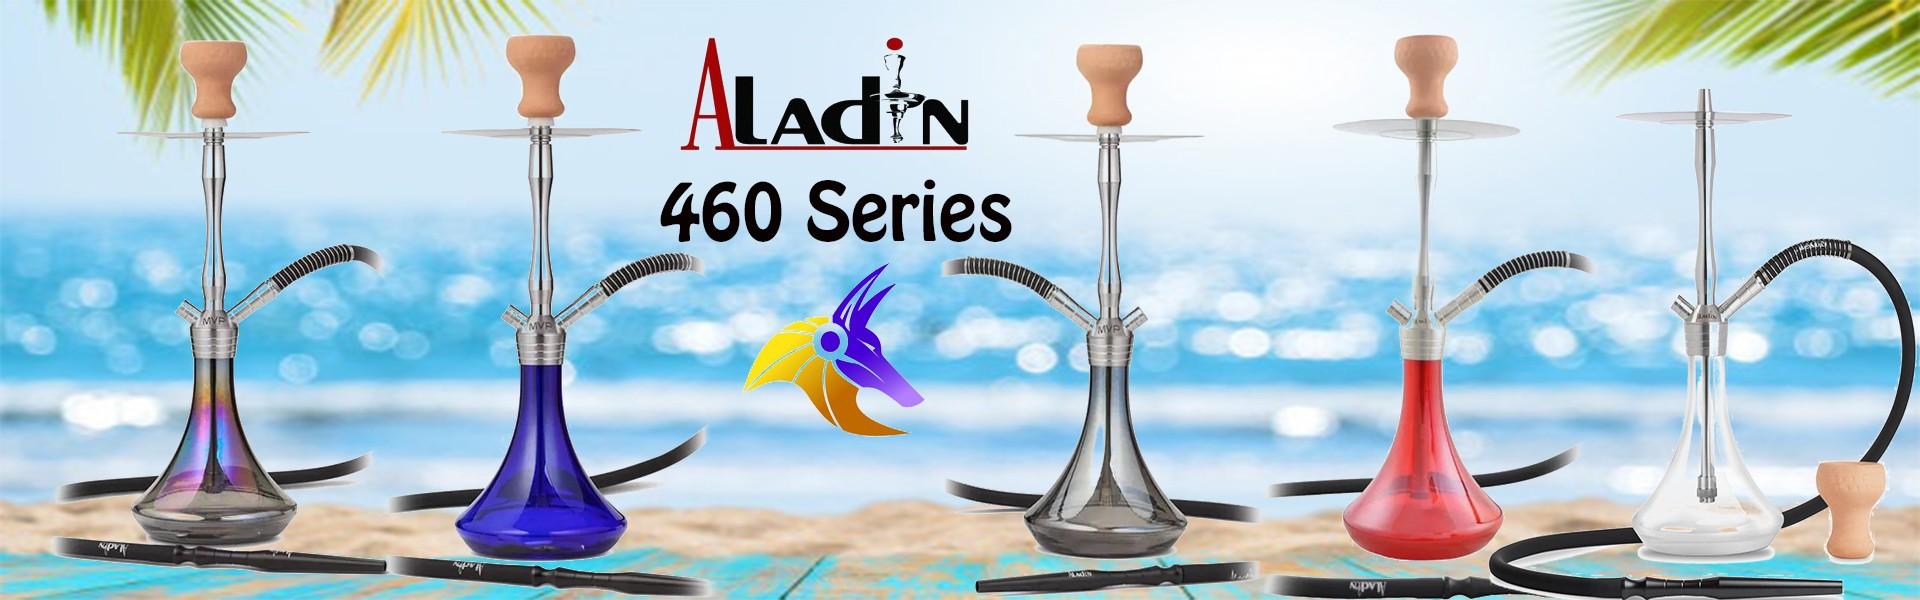 ALADIN 460